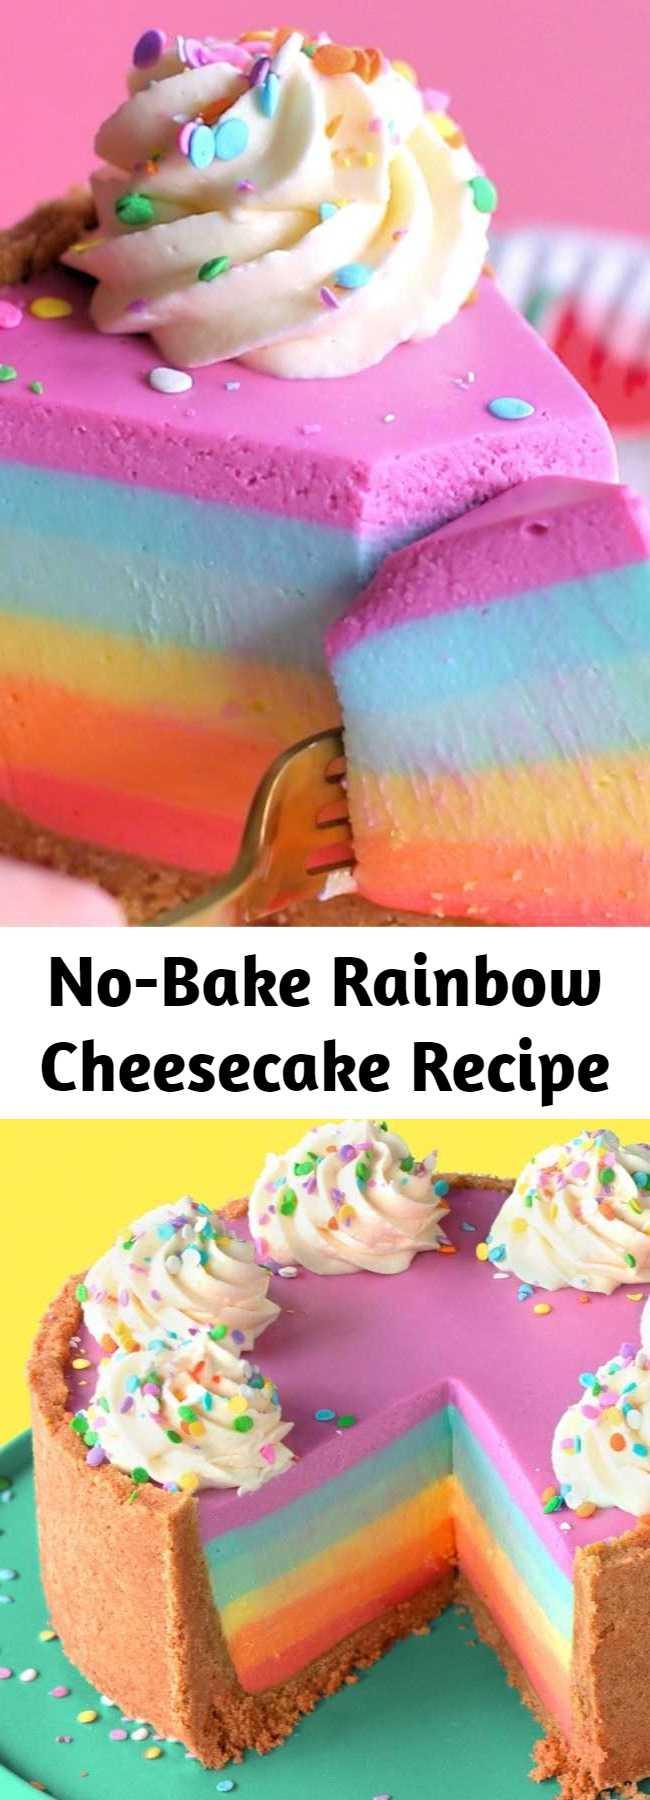 No-Bake Rainbow Cheesecake Recipe - A no-bake white chocolate rainbow cheesecake that's super simple to make!